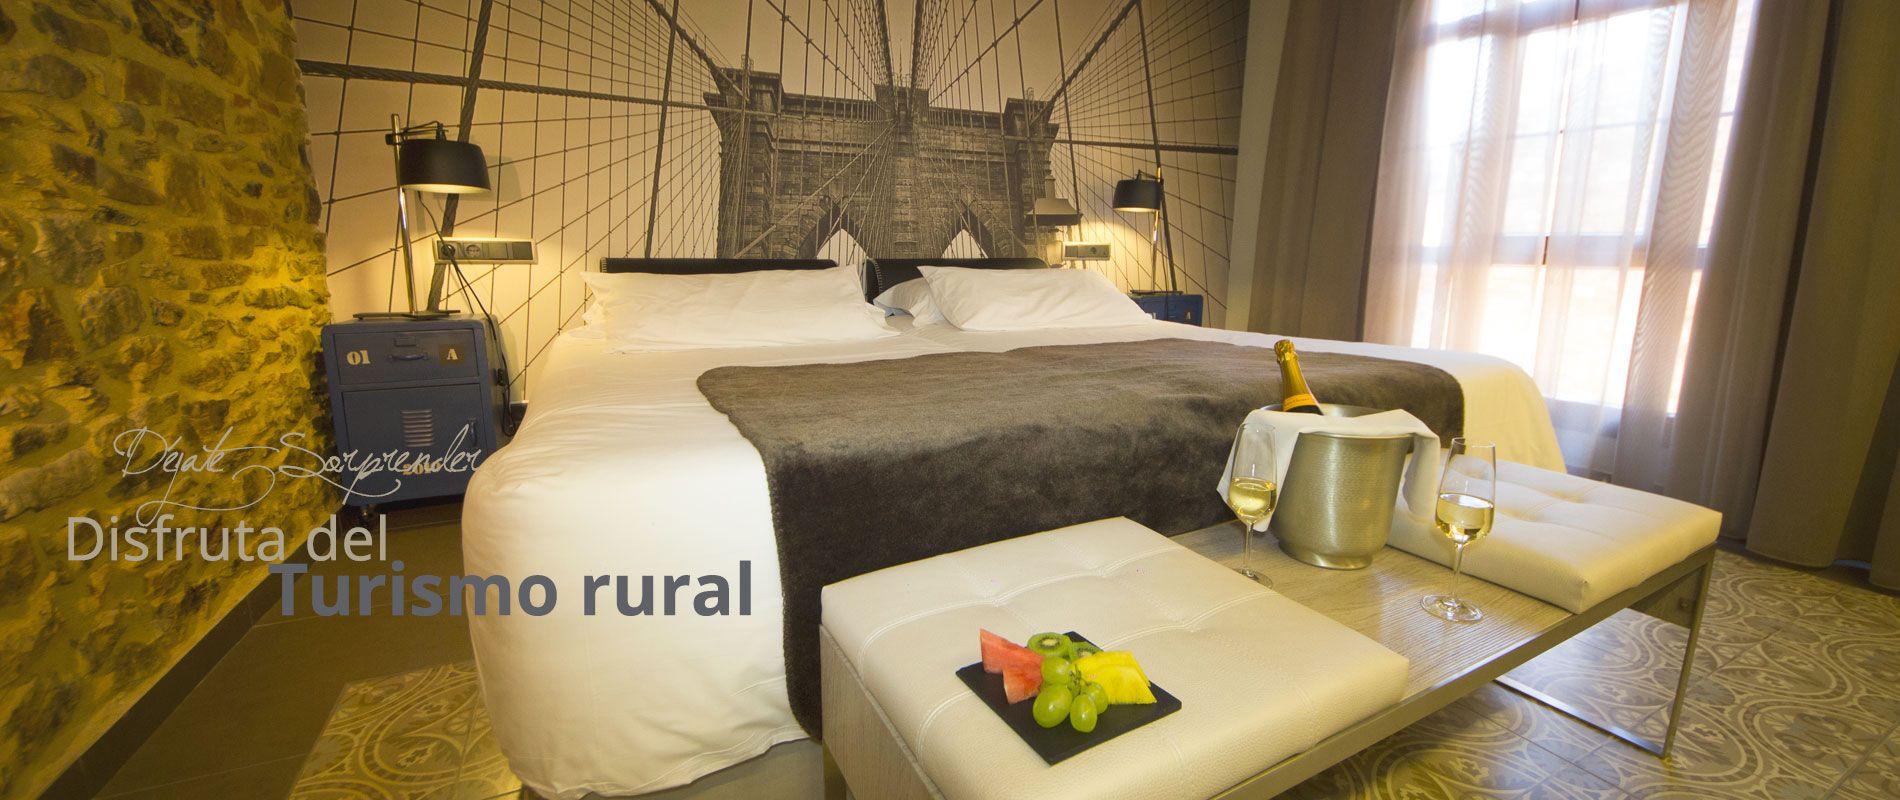 Hotel La Posada de Mosqueruela en Teruel